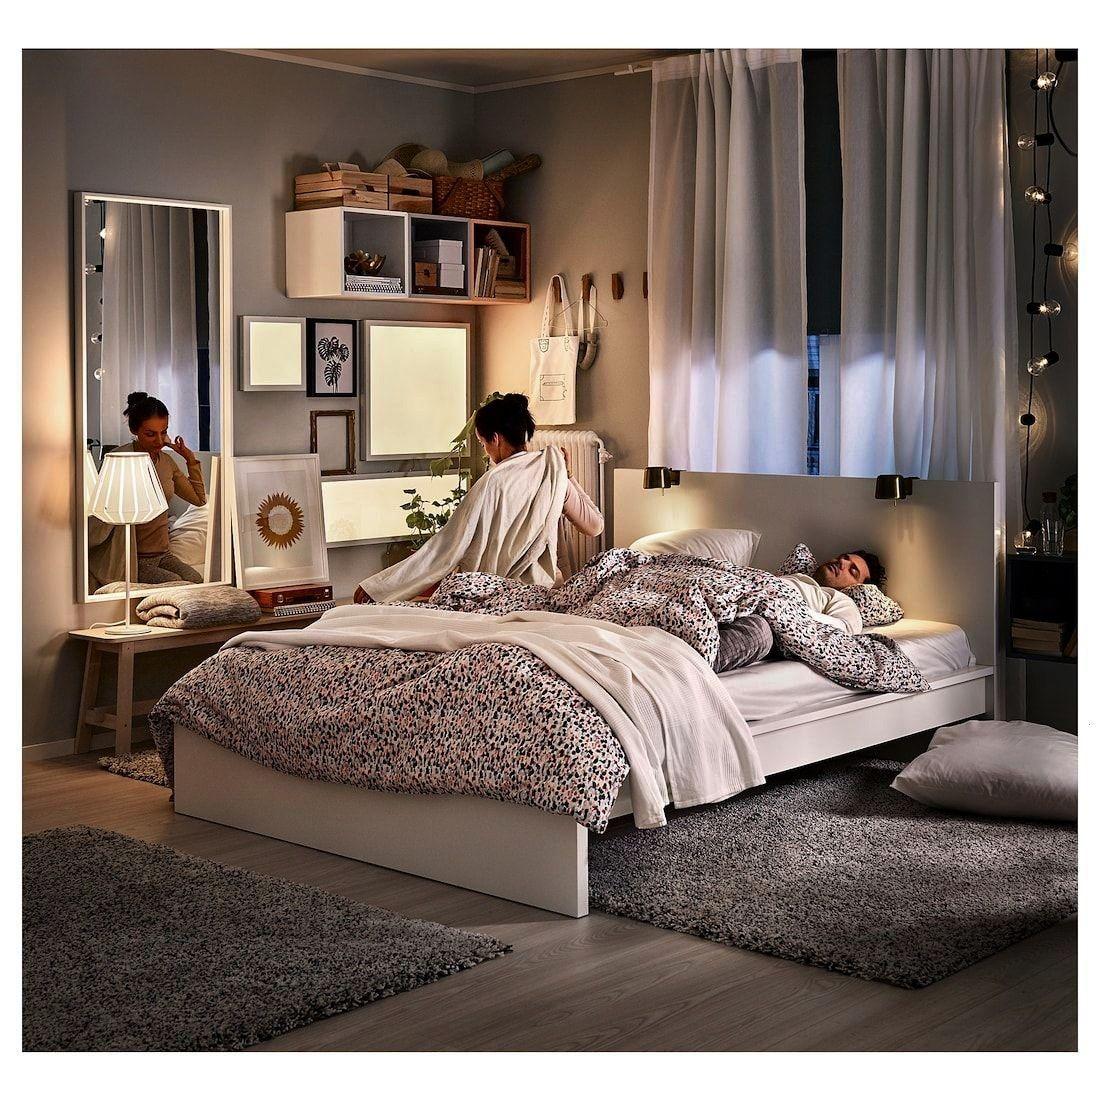 luröy #frame #white #malm #high #ikea #bedMALM Bed frame